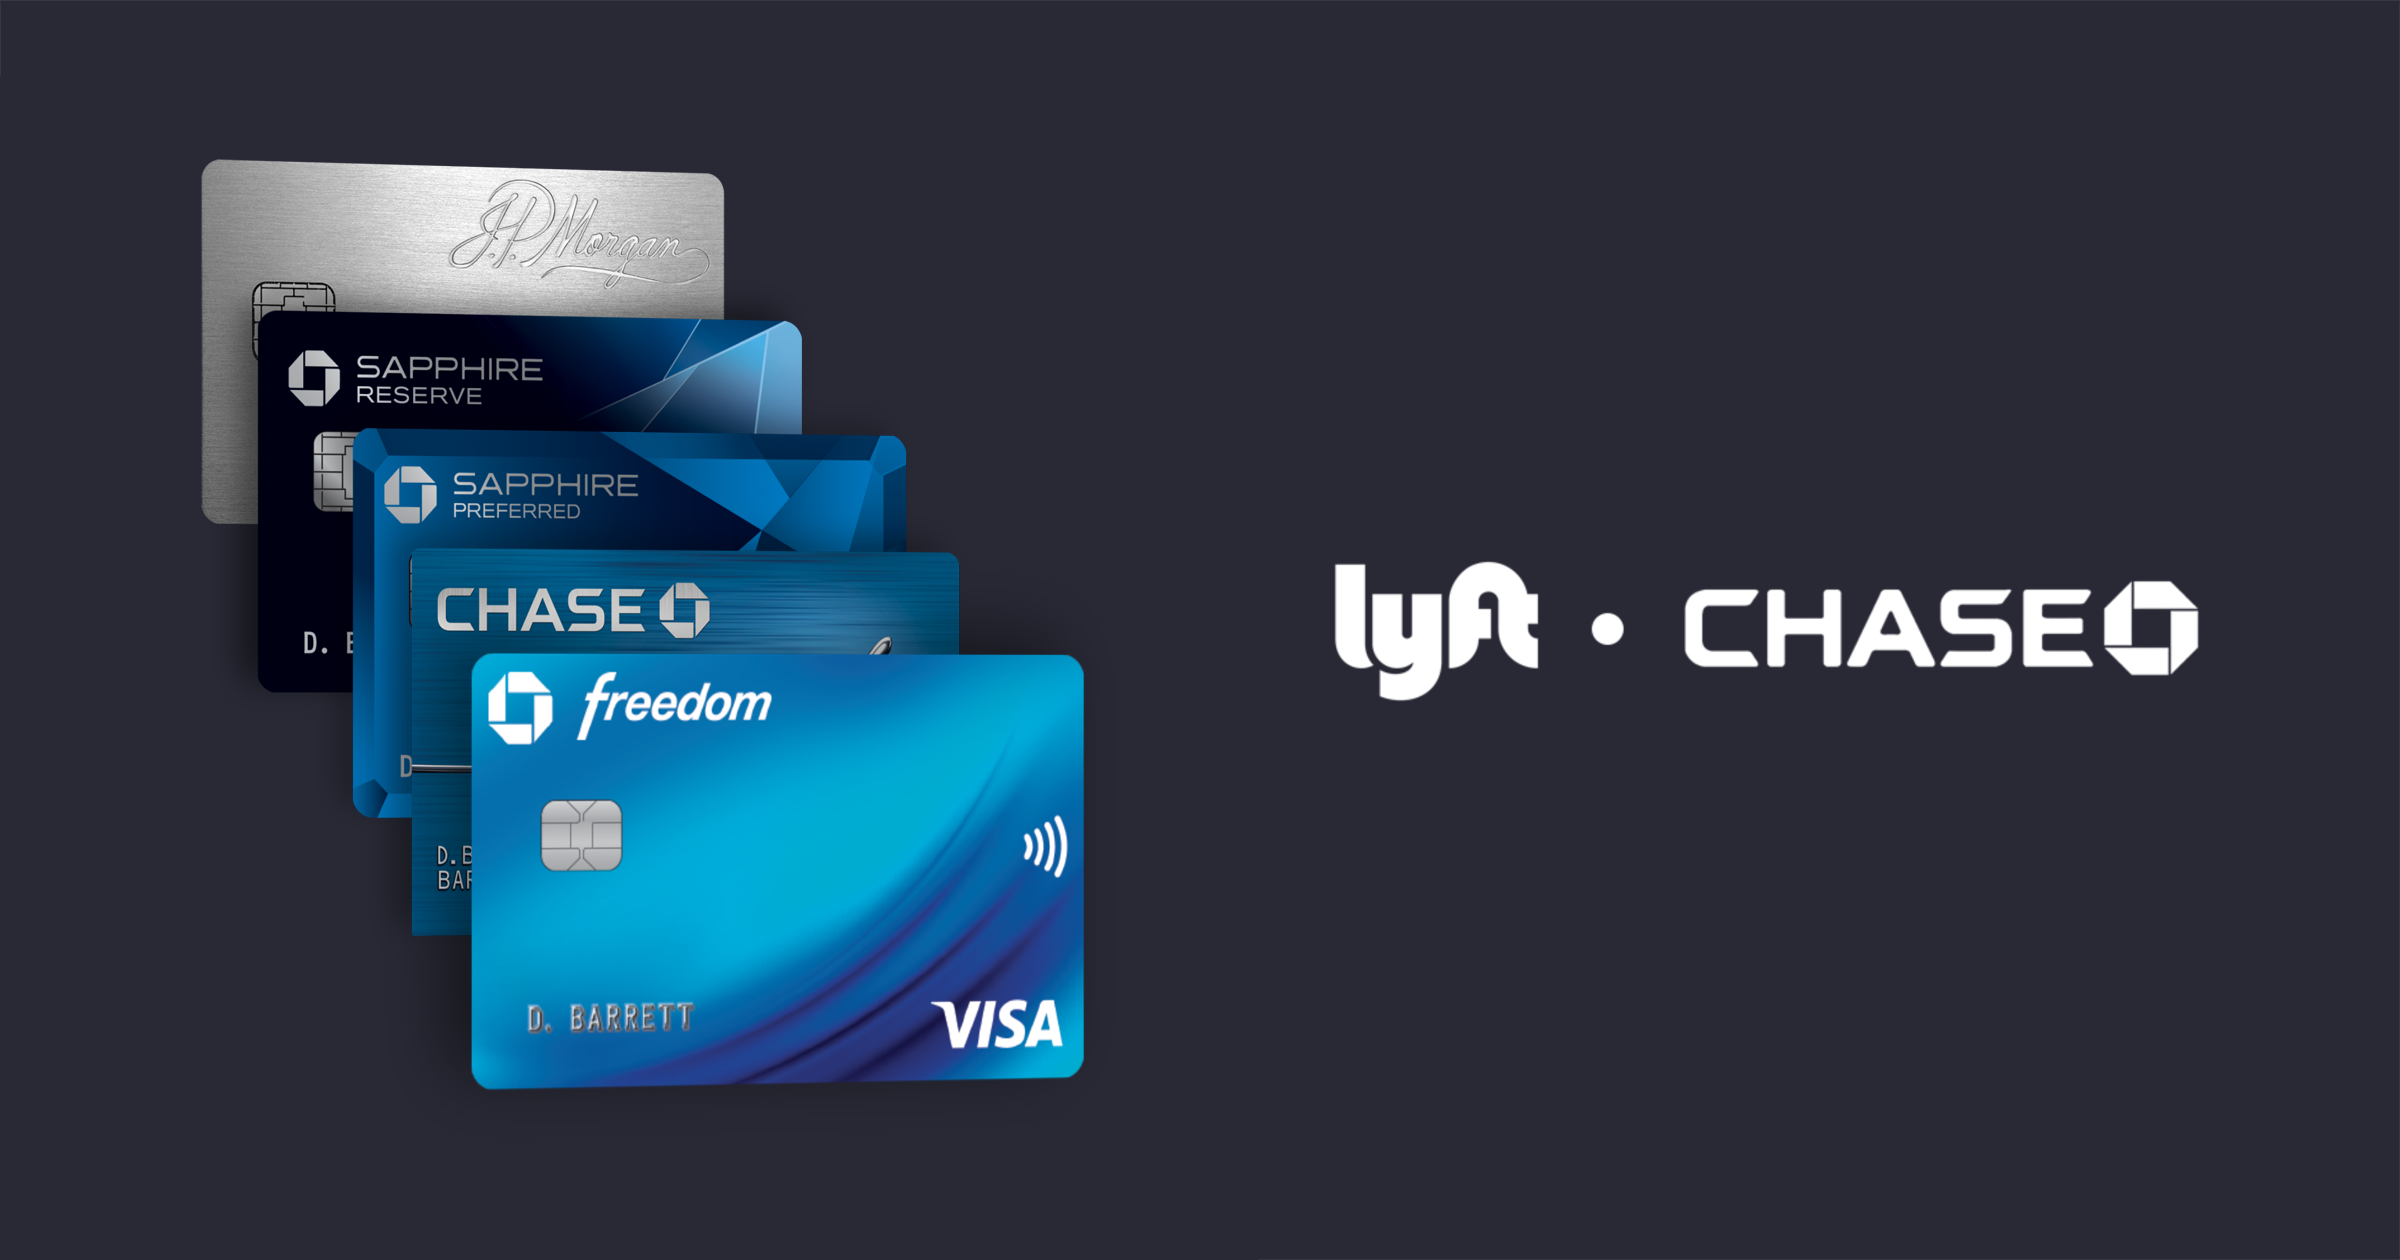 Chase Freedom - 5% Back on Lyft Rides through 03/2022